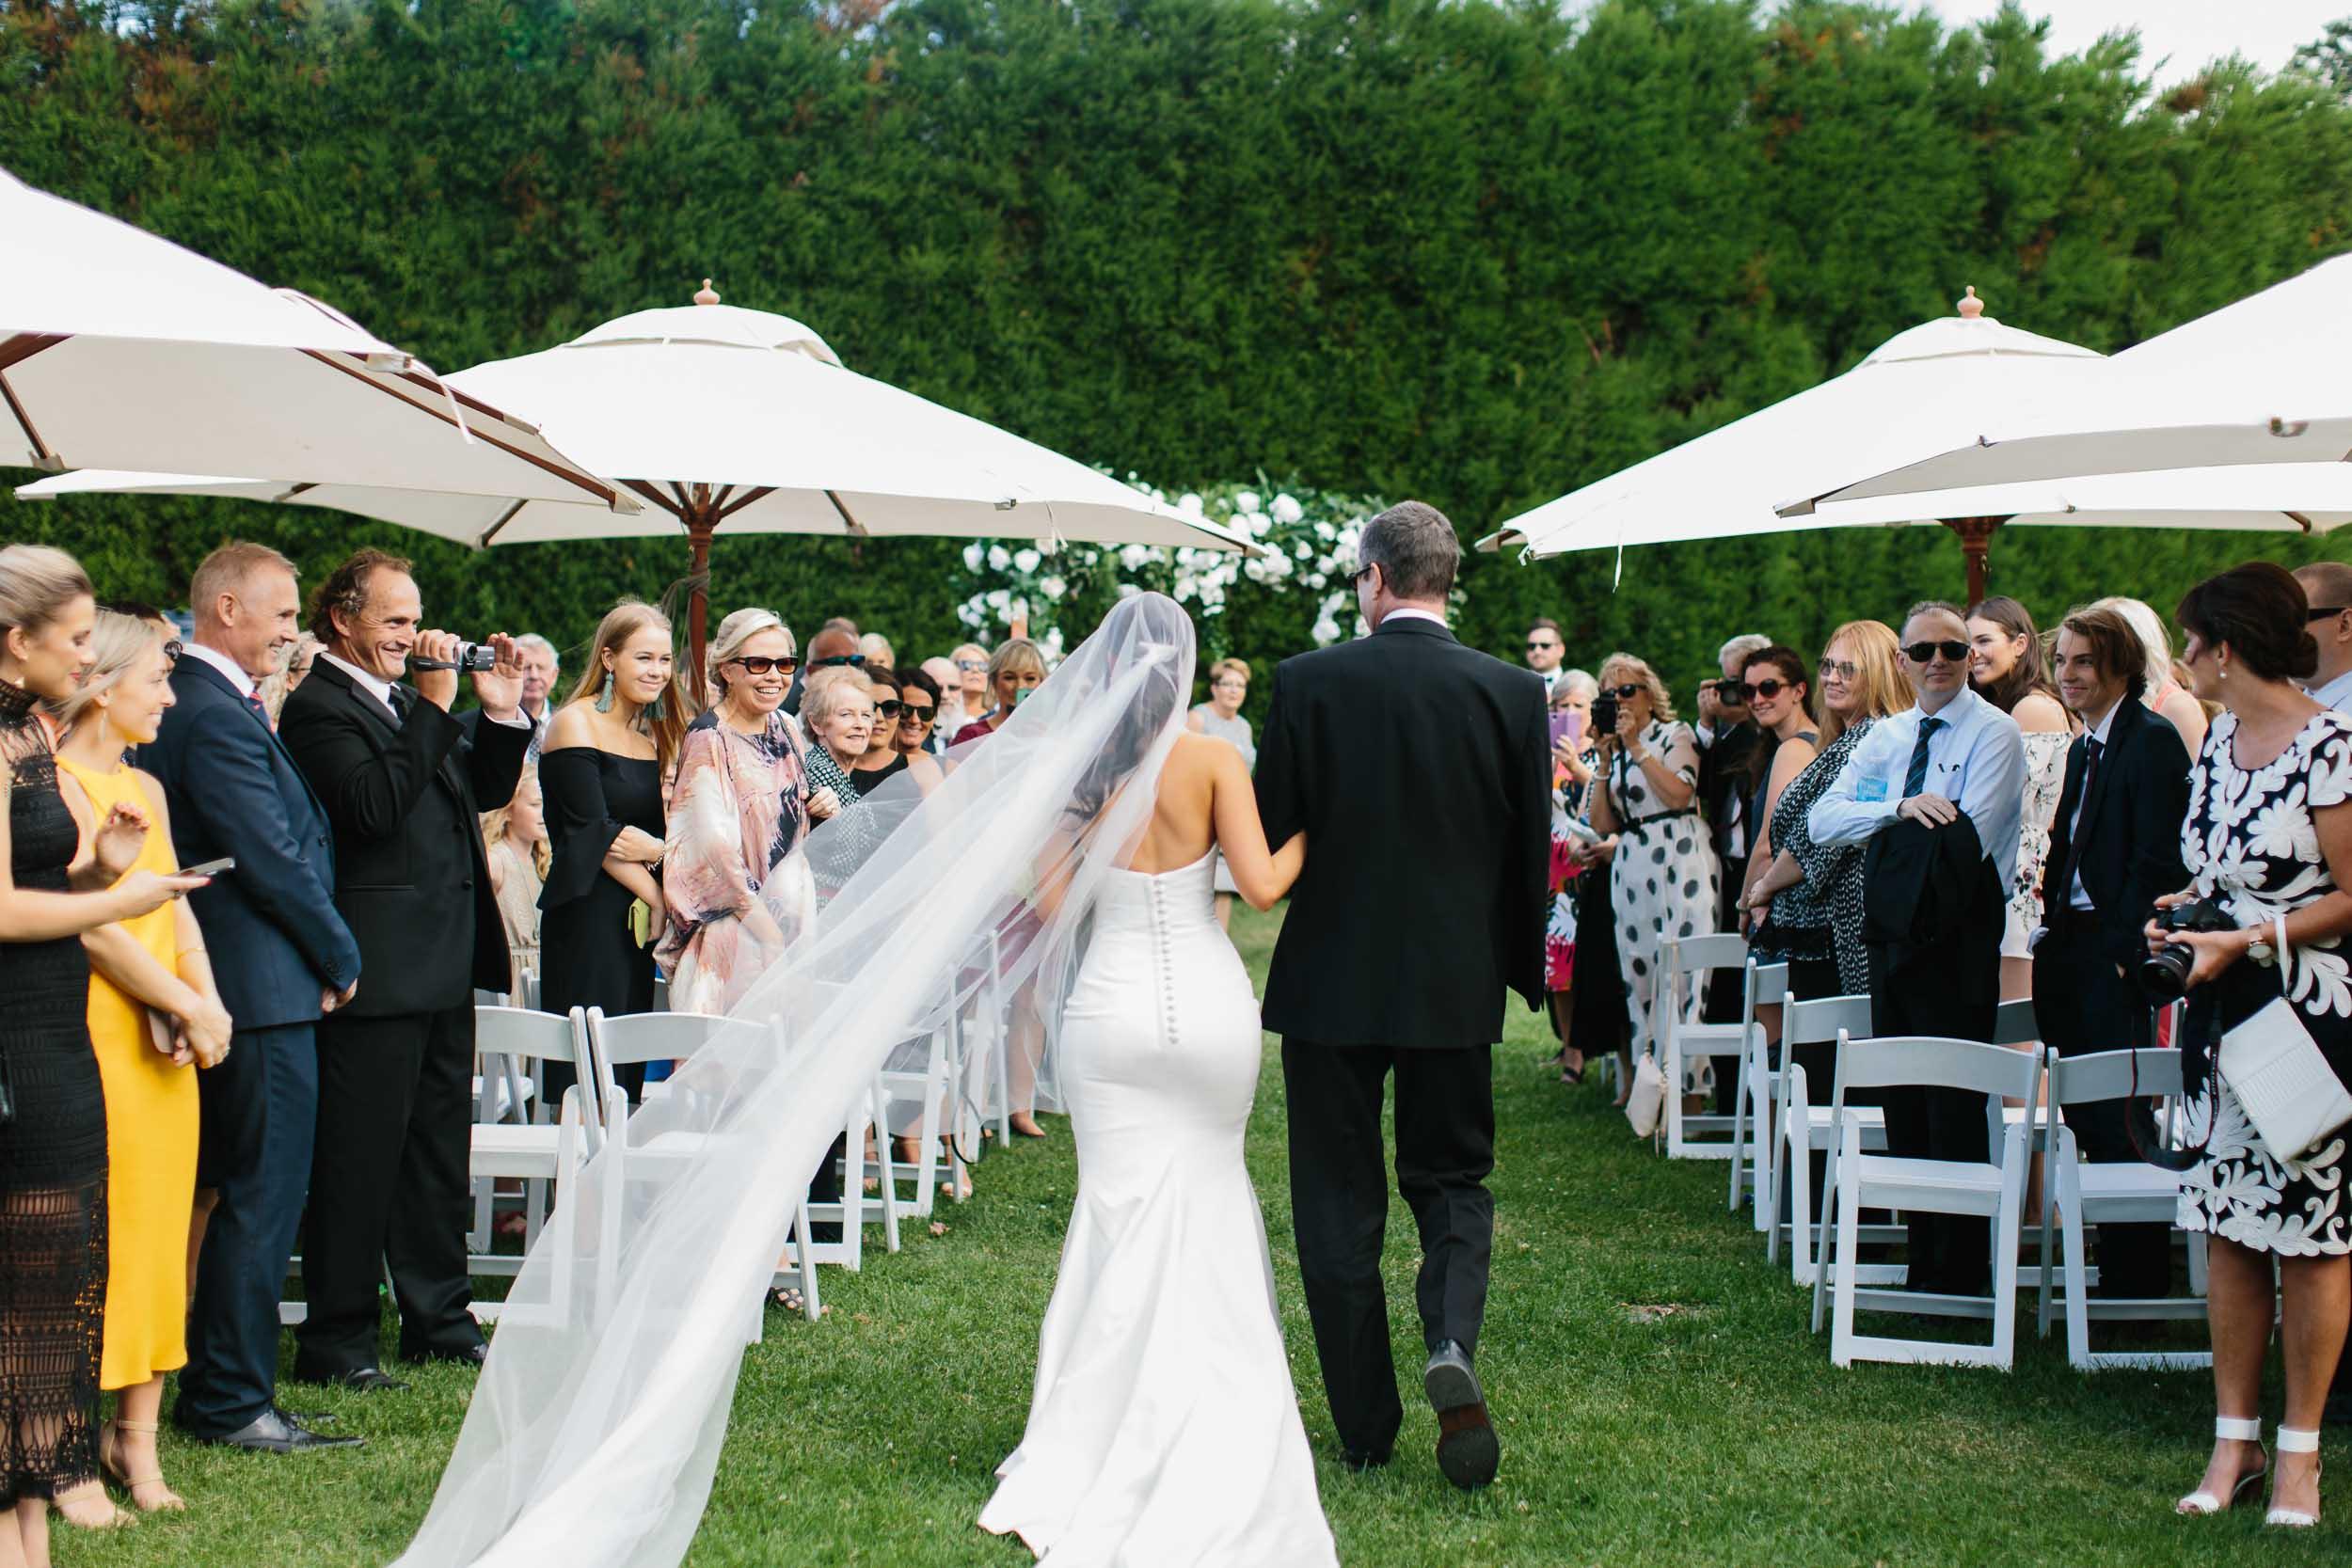 Kas-Richards-Melbourne-Garden-Wedding-Aerial-South-Whark-Georgia-Young-Couture-165.jpg